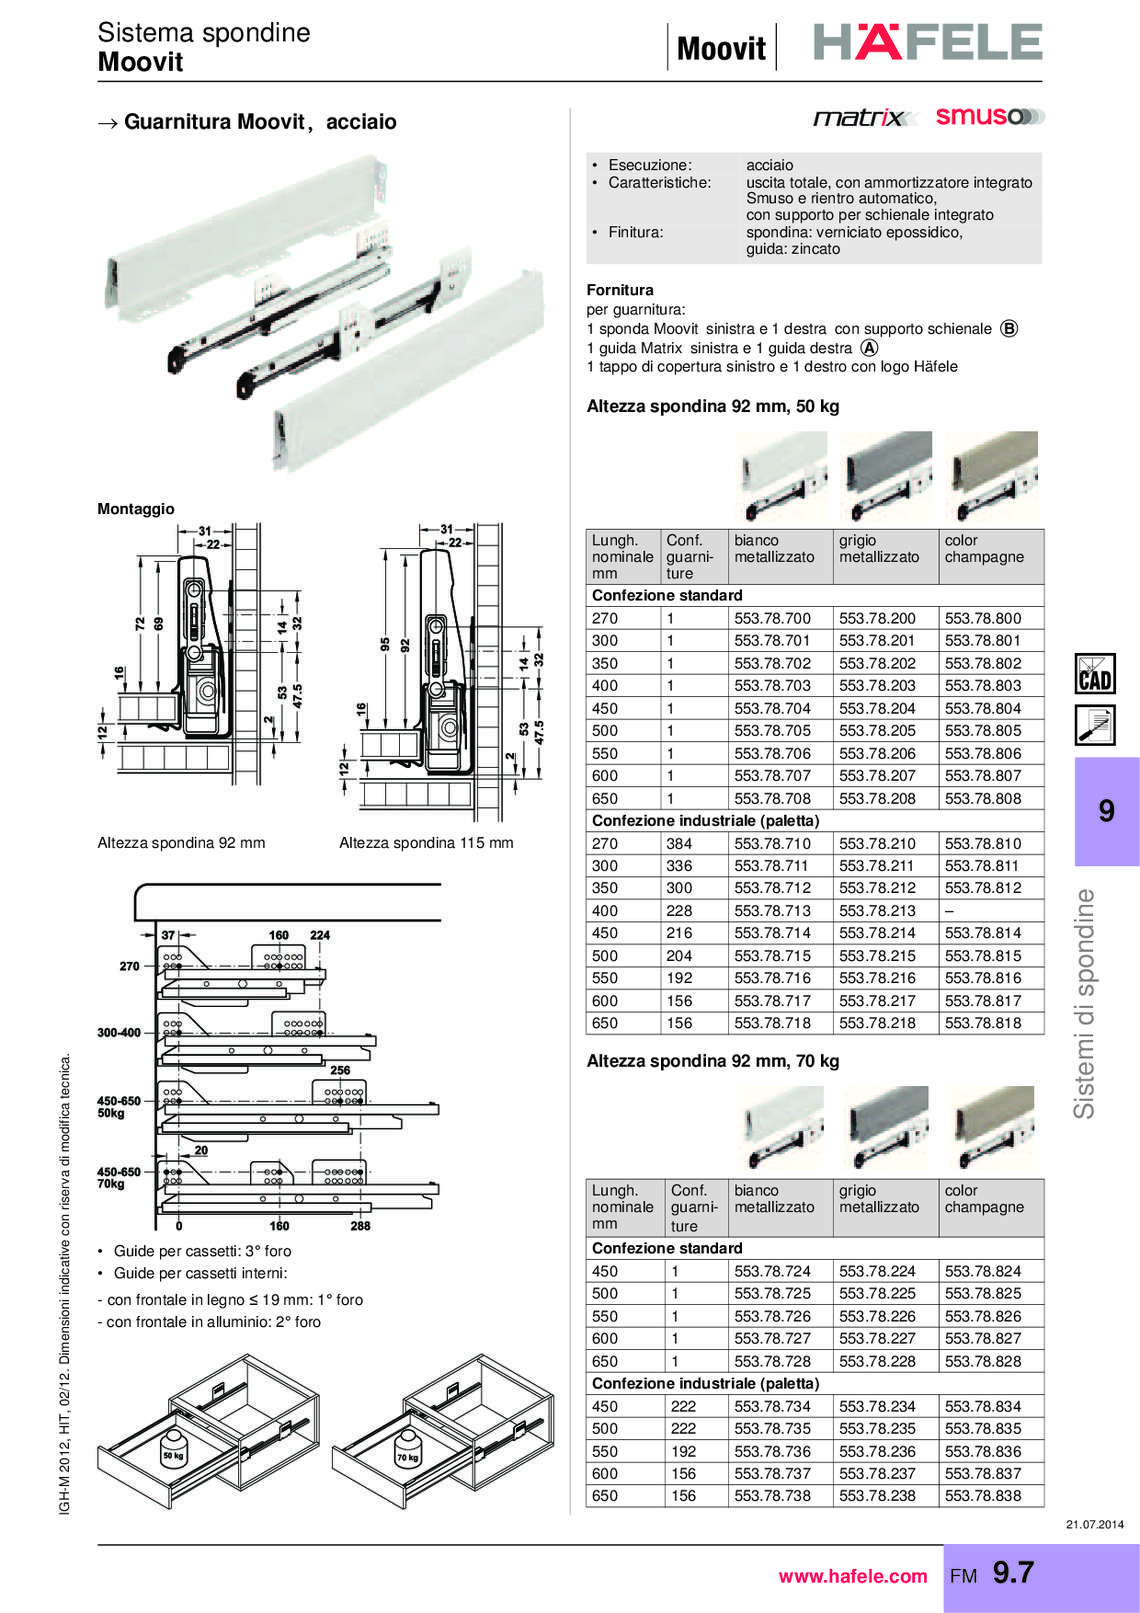 hafele-spondine-e-guide-per-mobili_40_016.jpg